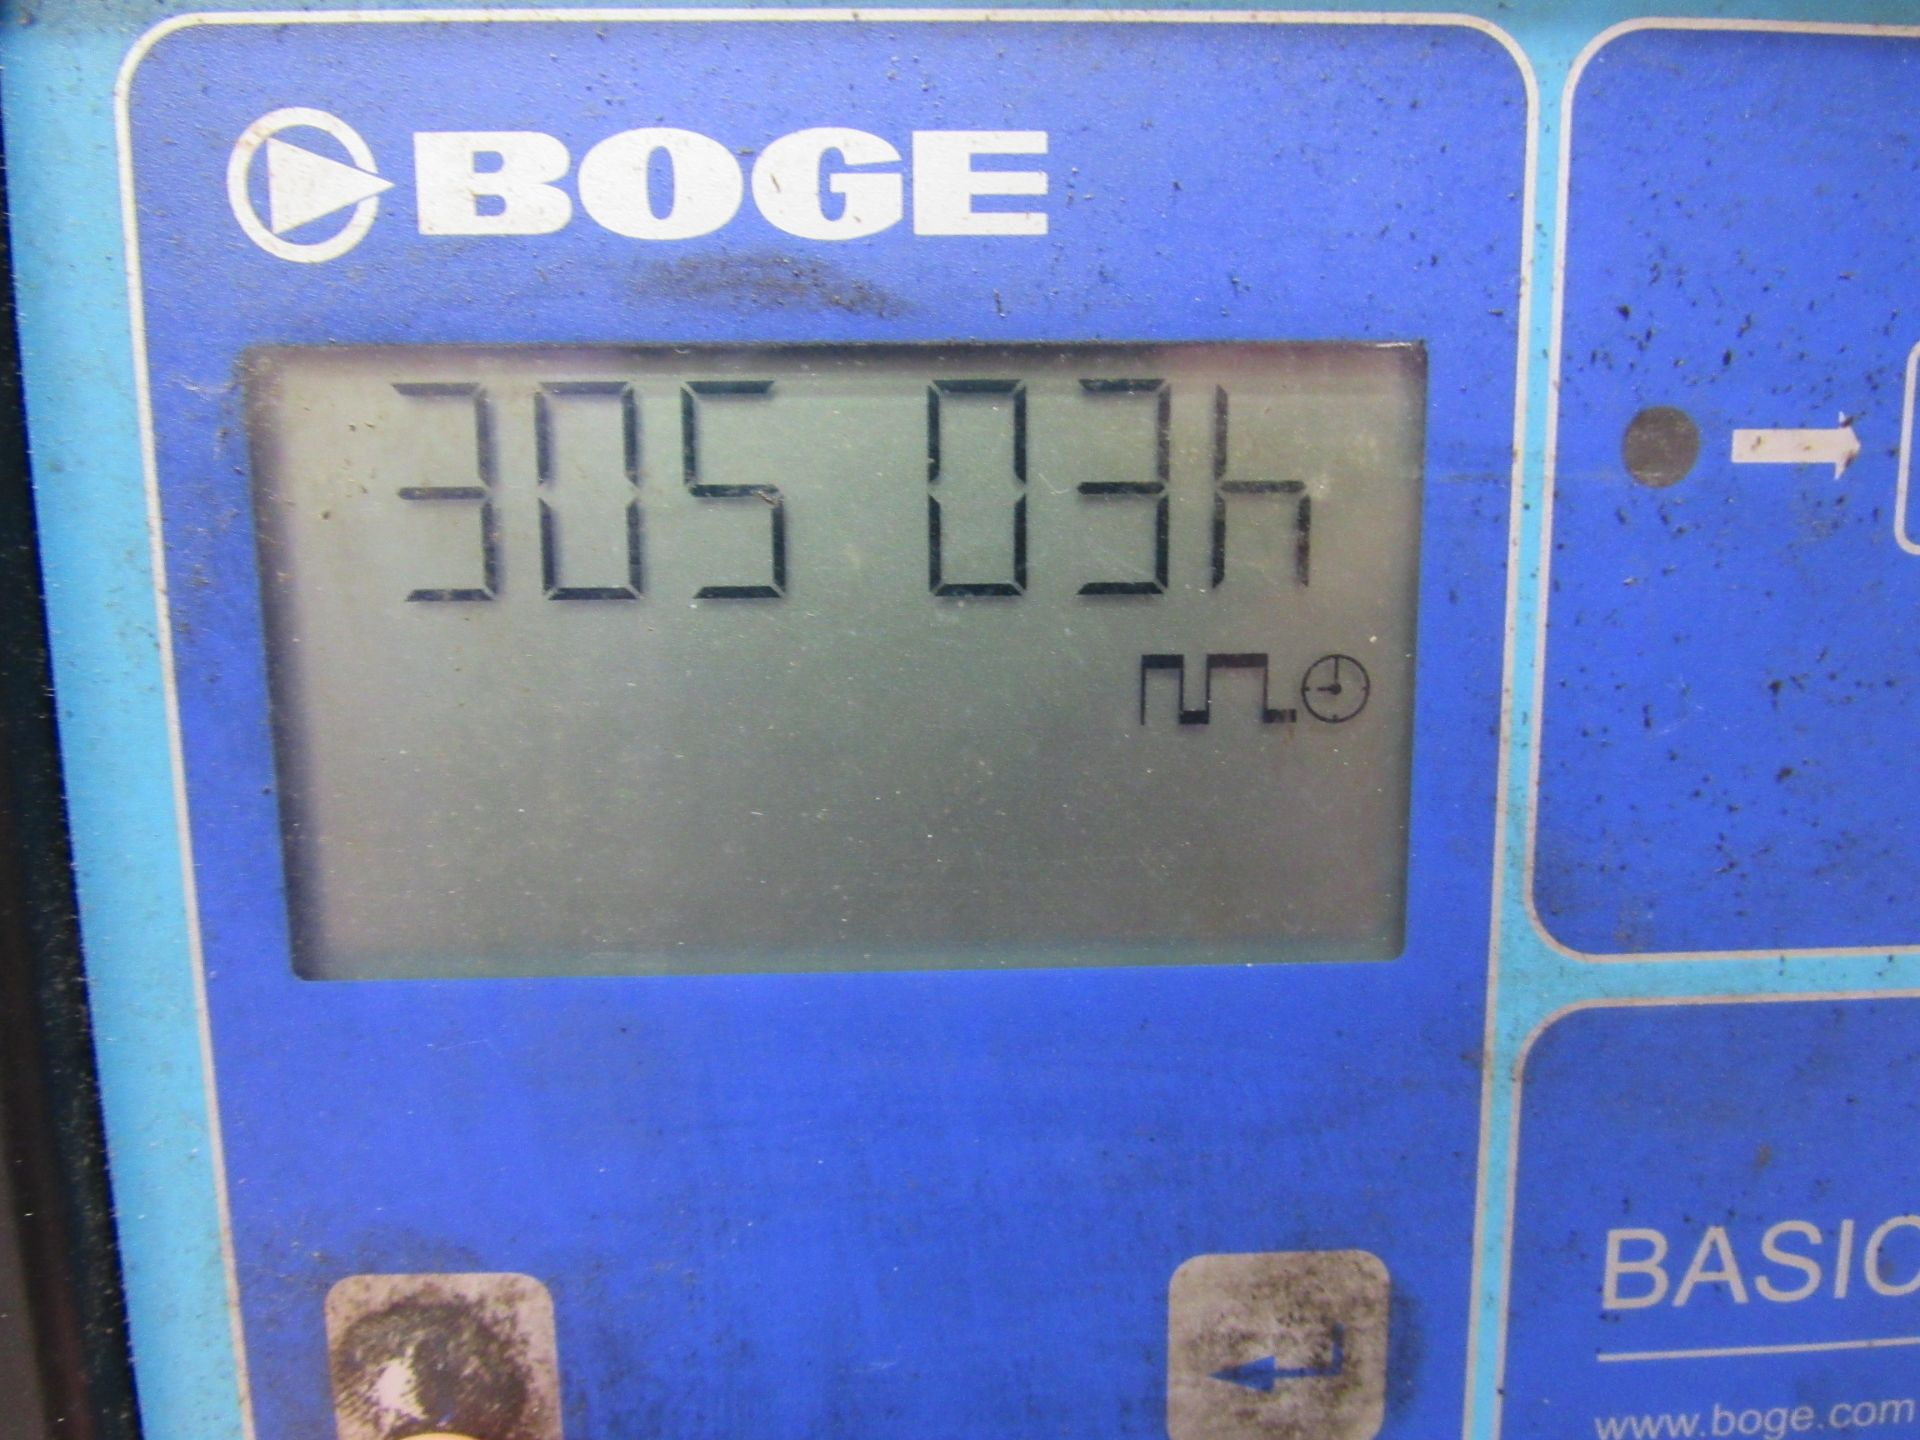 Boge 515 30,503 Hours, 24,892 Hours, 2797 Hours, Serial Number 560123 - Image 3 of 5